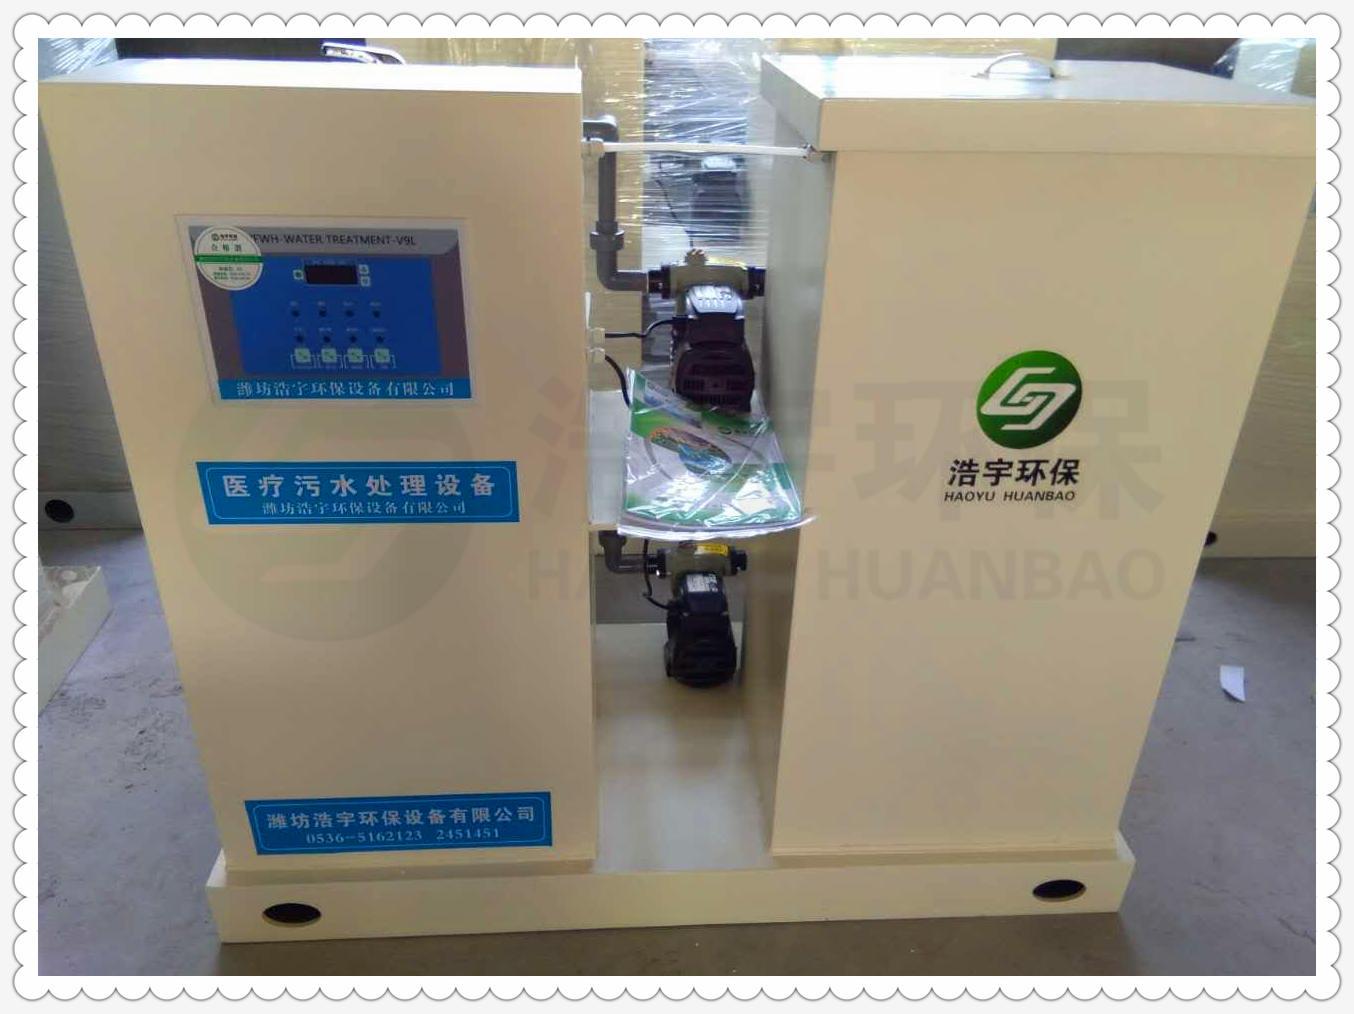 HYCY-520手術室污水處理設備 <br> 全新  價格:6500 <br> <img src=http://k.kqzp.cn/img/up/img/5e002561ae146.jpg